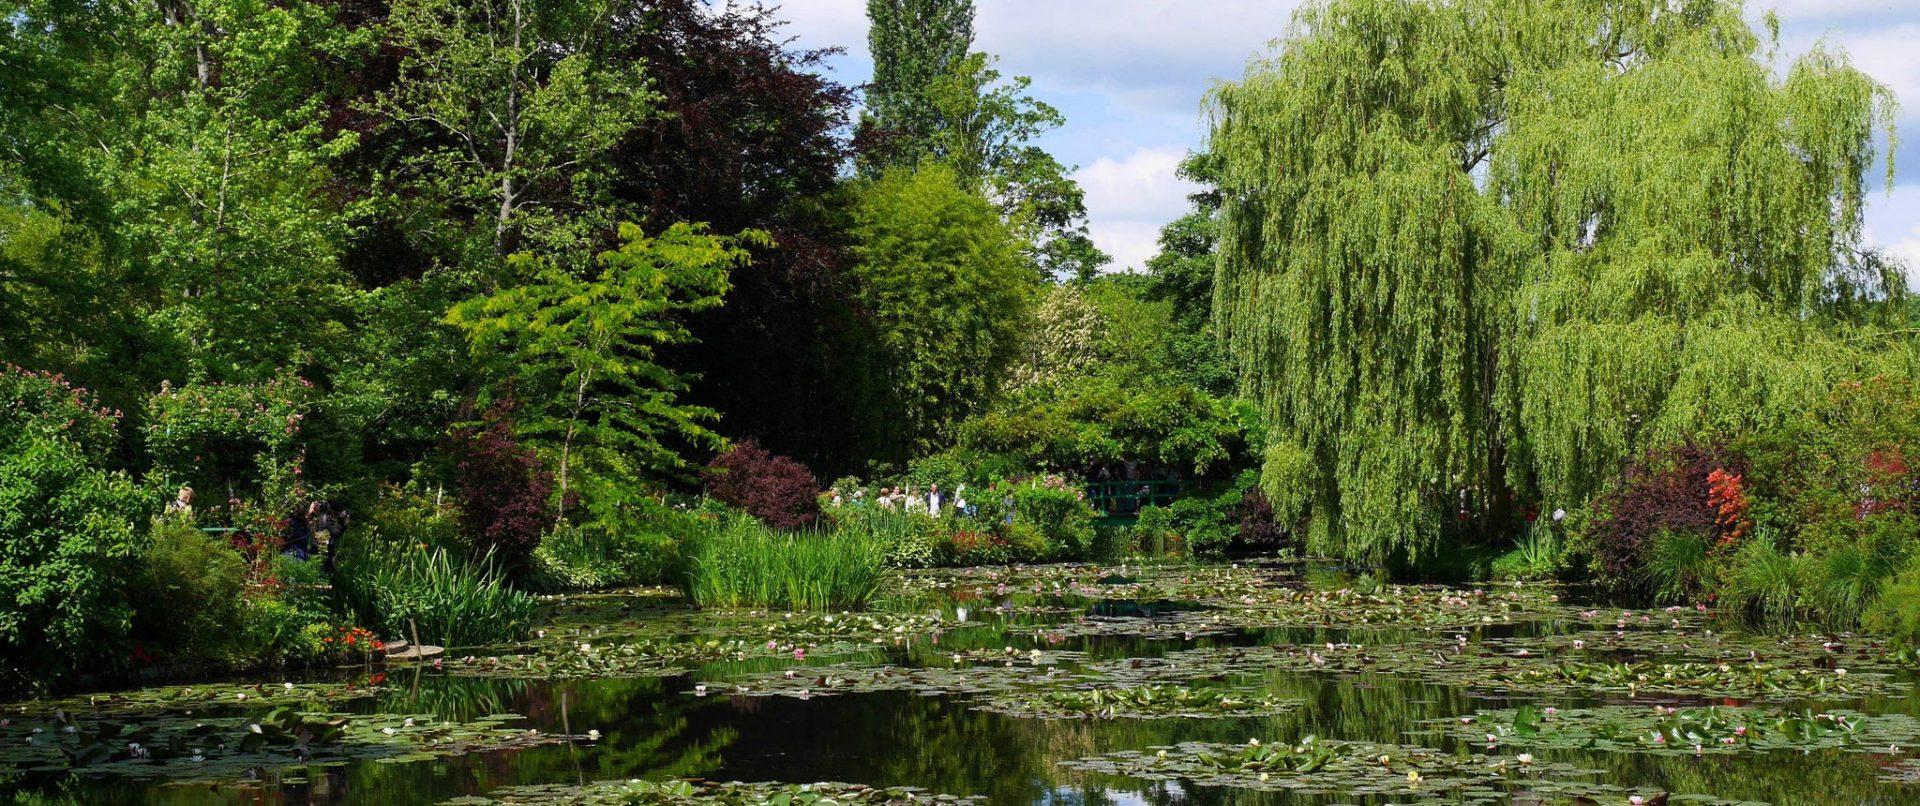 giverny-Monet-family-tour